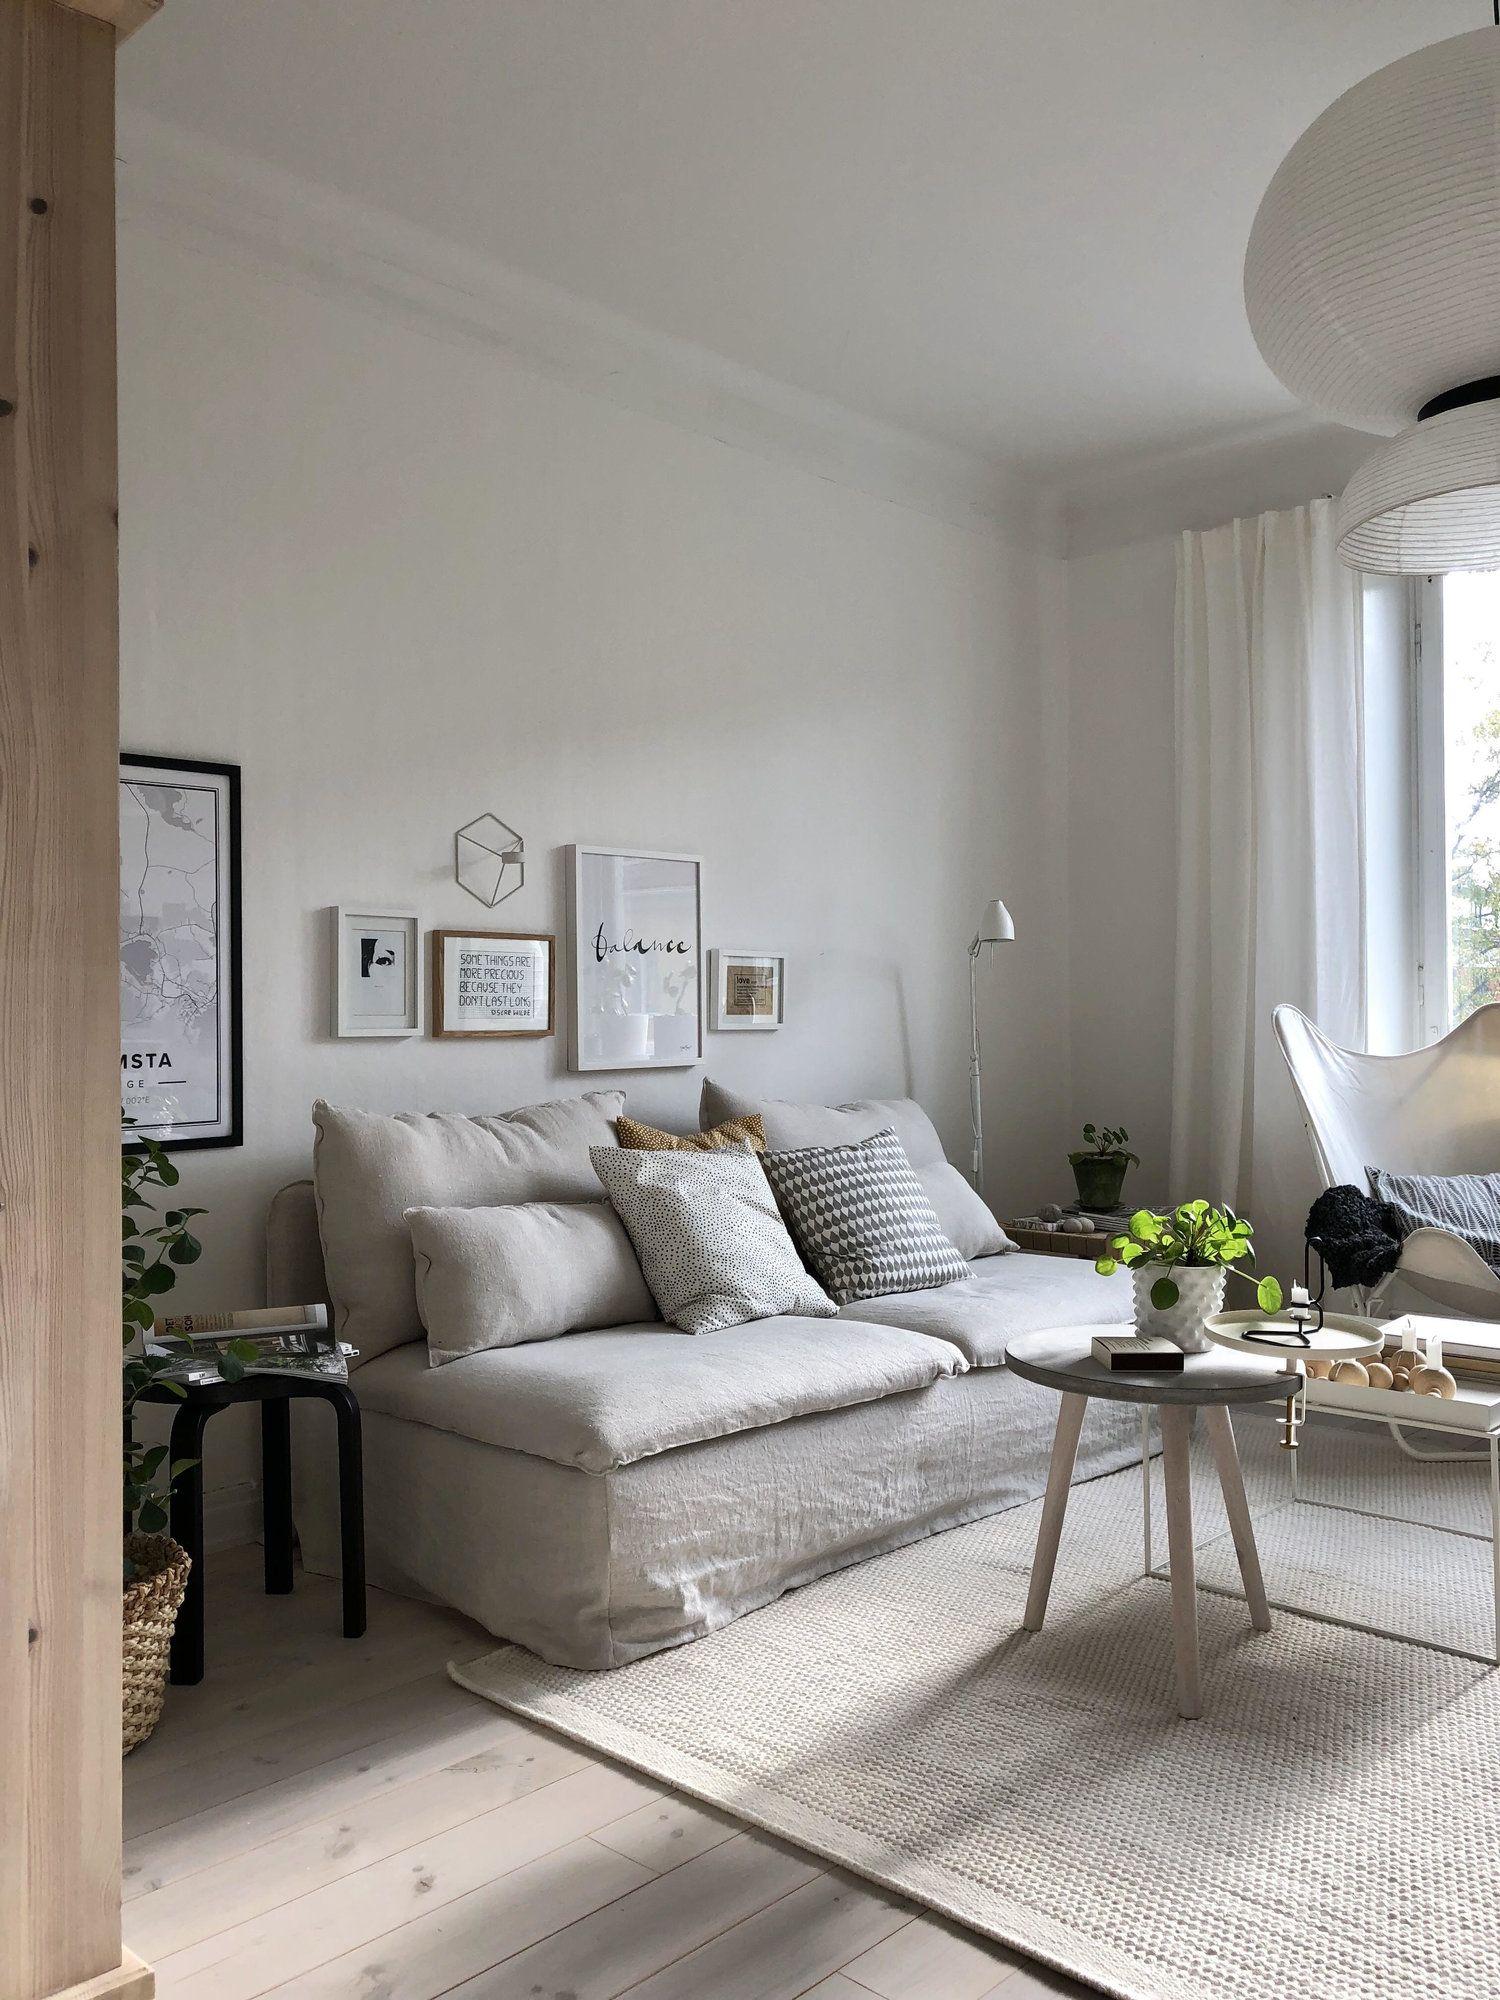 At Home With Anna Rolander Nordique Nordic Lifestyle Scandinavian Design Nordic Products Scandinavian Travel Contemporary Home Decor Nordic Interior Bedroom Living Room Scandinavian